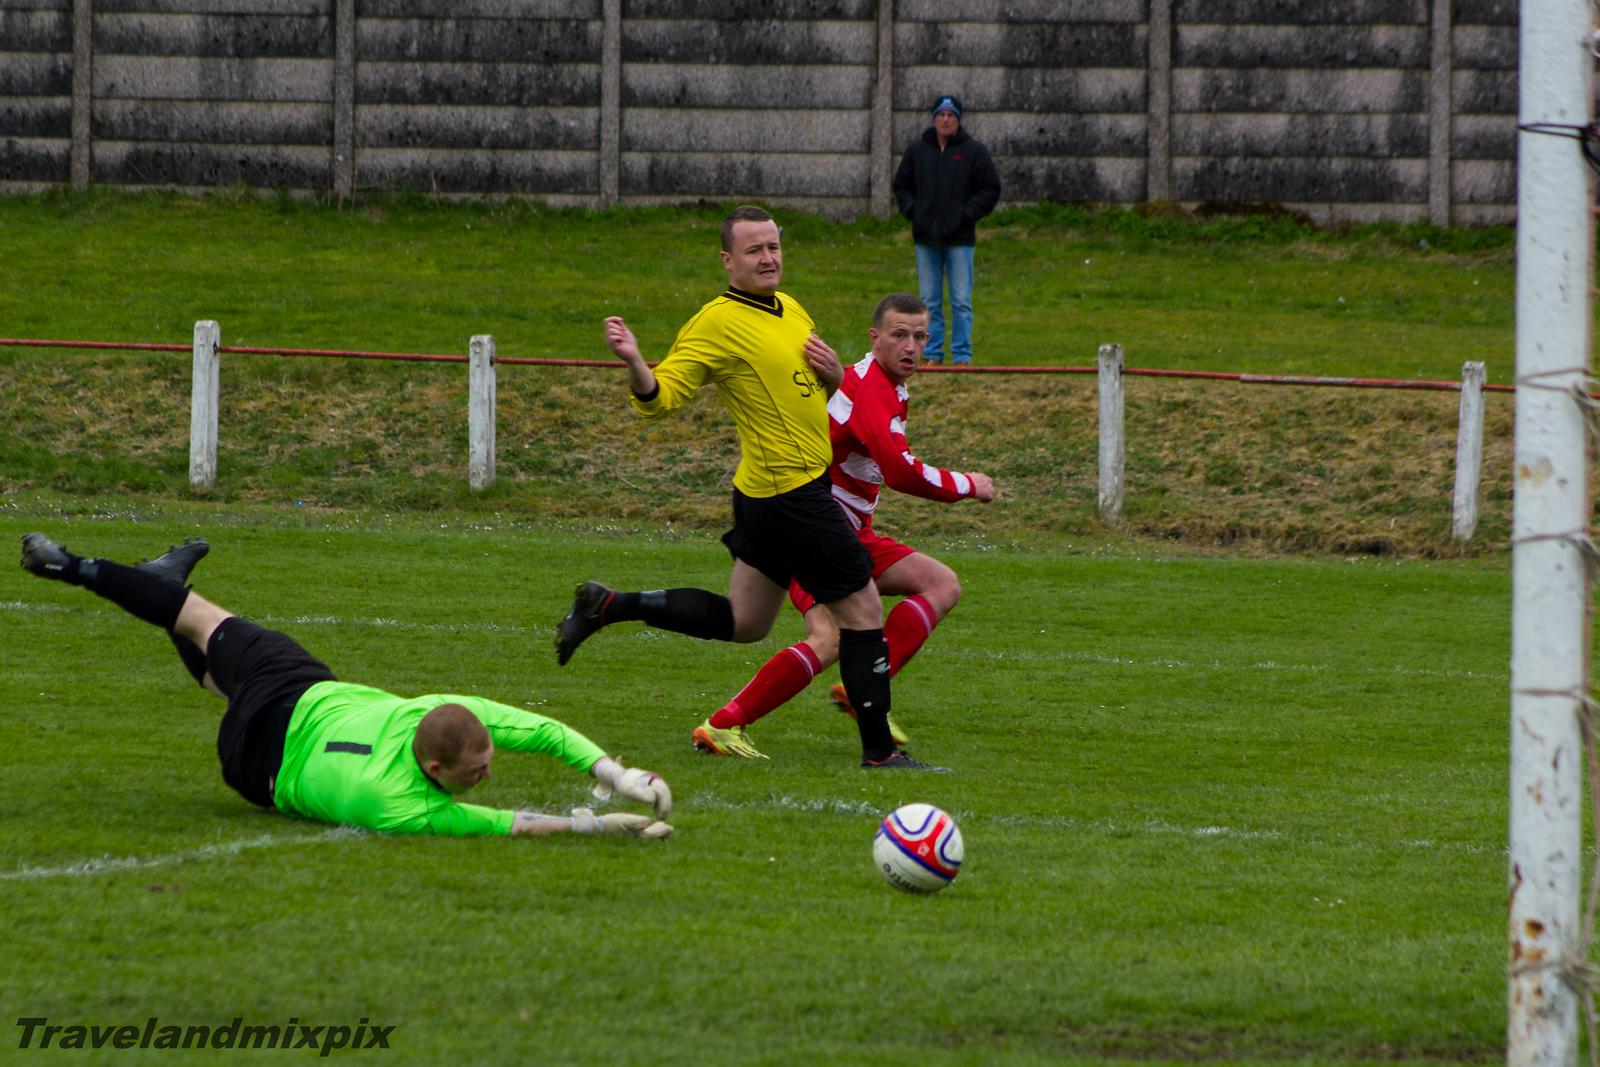 Johnstone Burgh 5 Newmains Utd 2<br> Stagecoach West of Scotland League<br> Central District Second Division<br> Keanie Park<br> 02/05/2015<br> <i>Jason Hardie makes the score 5-2</i>